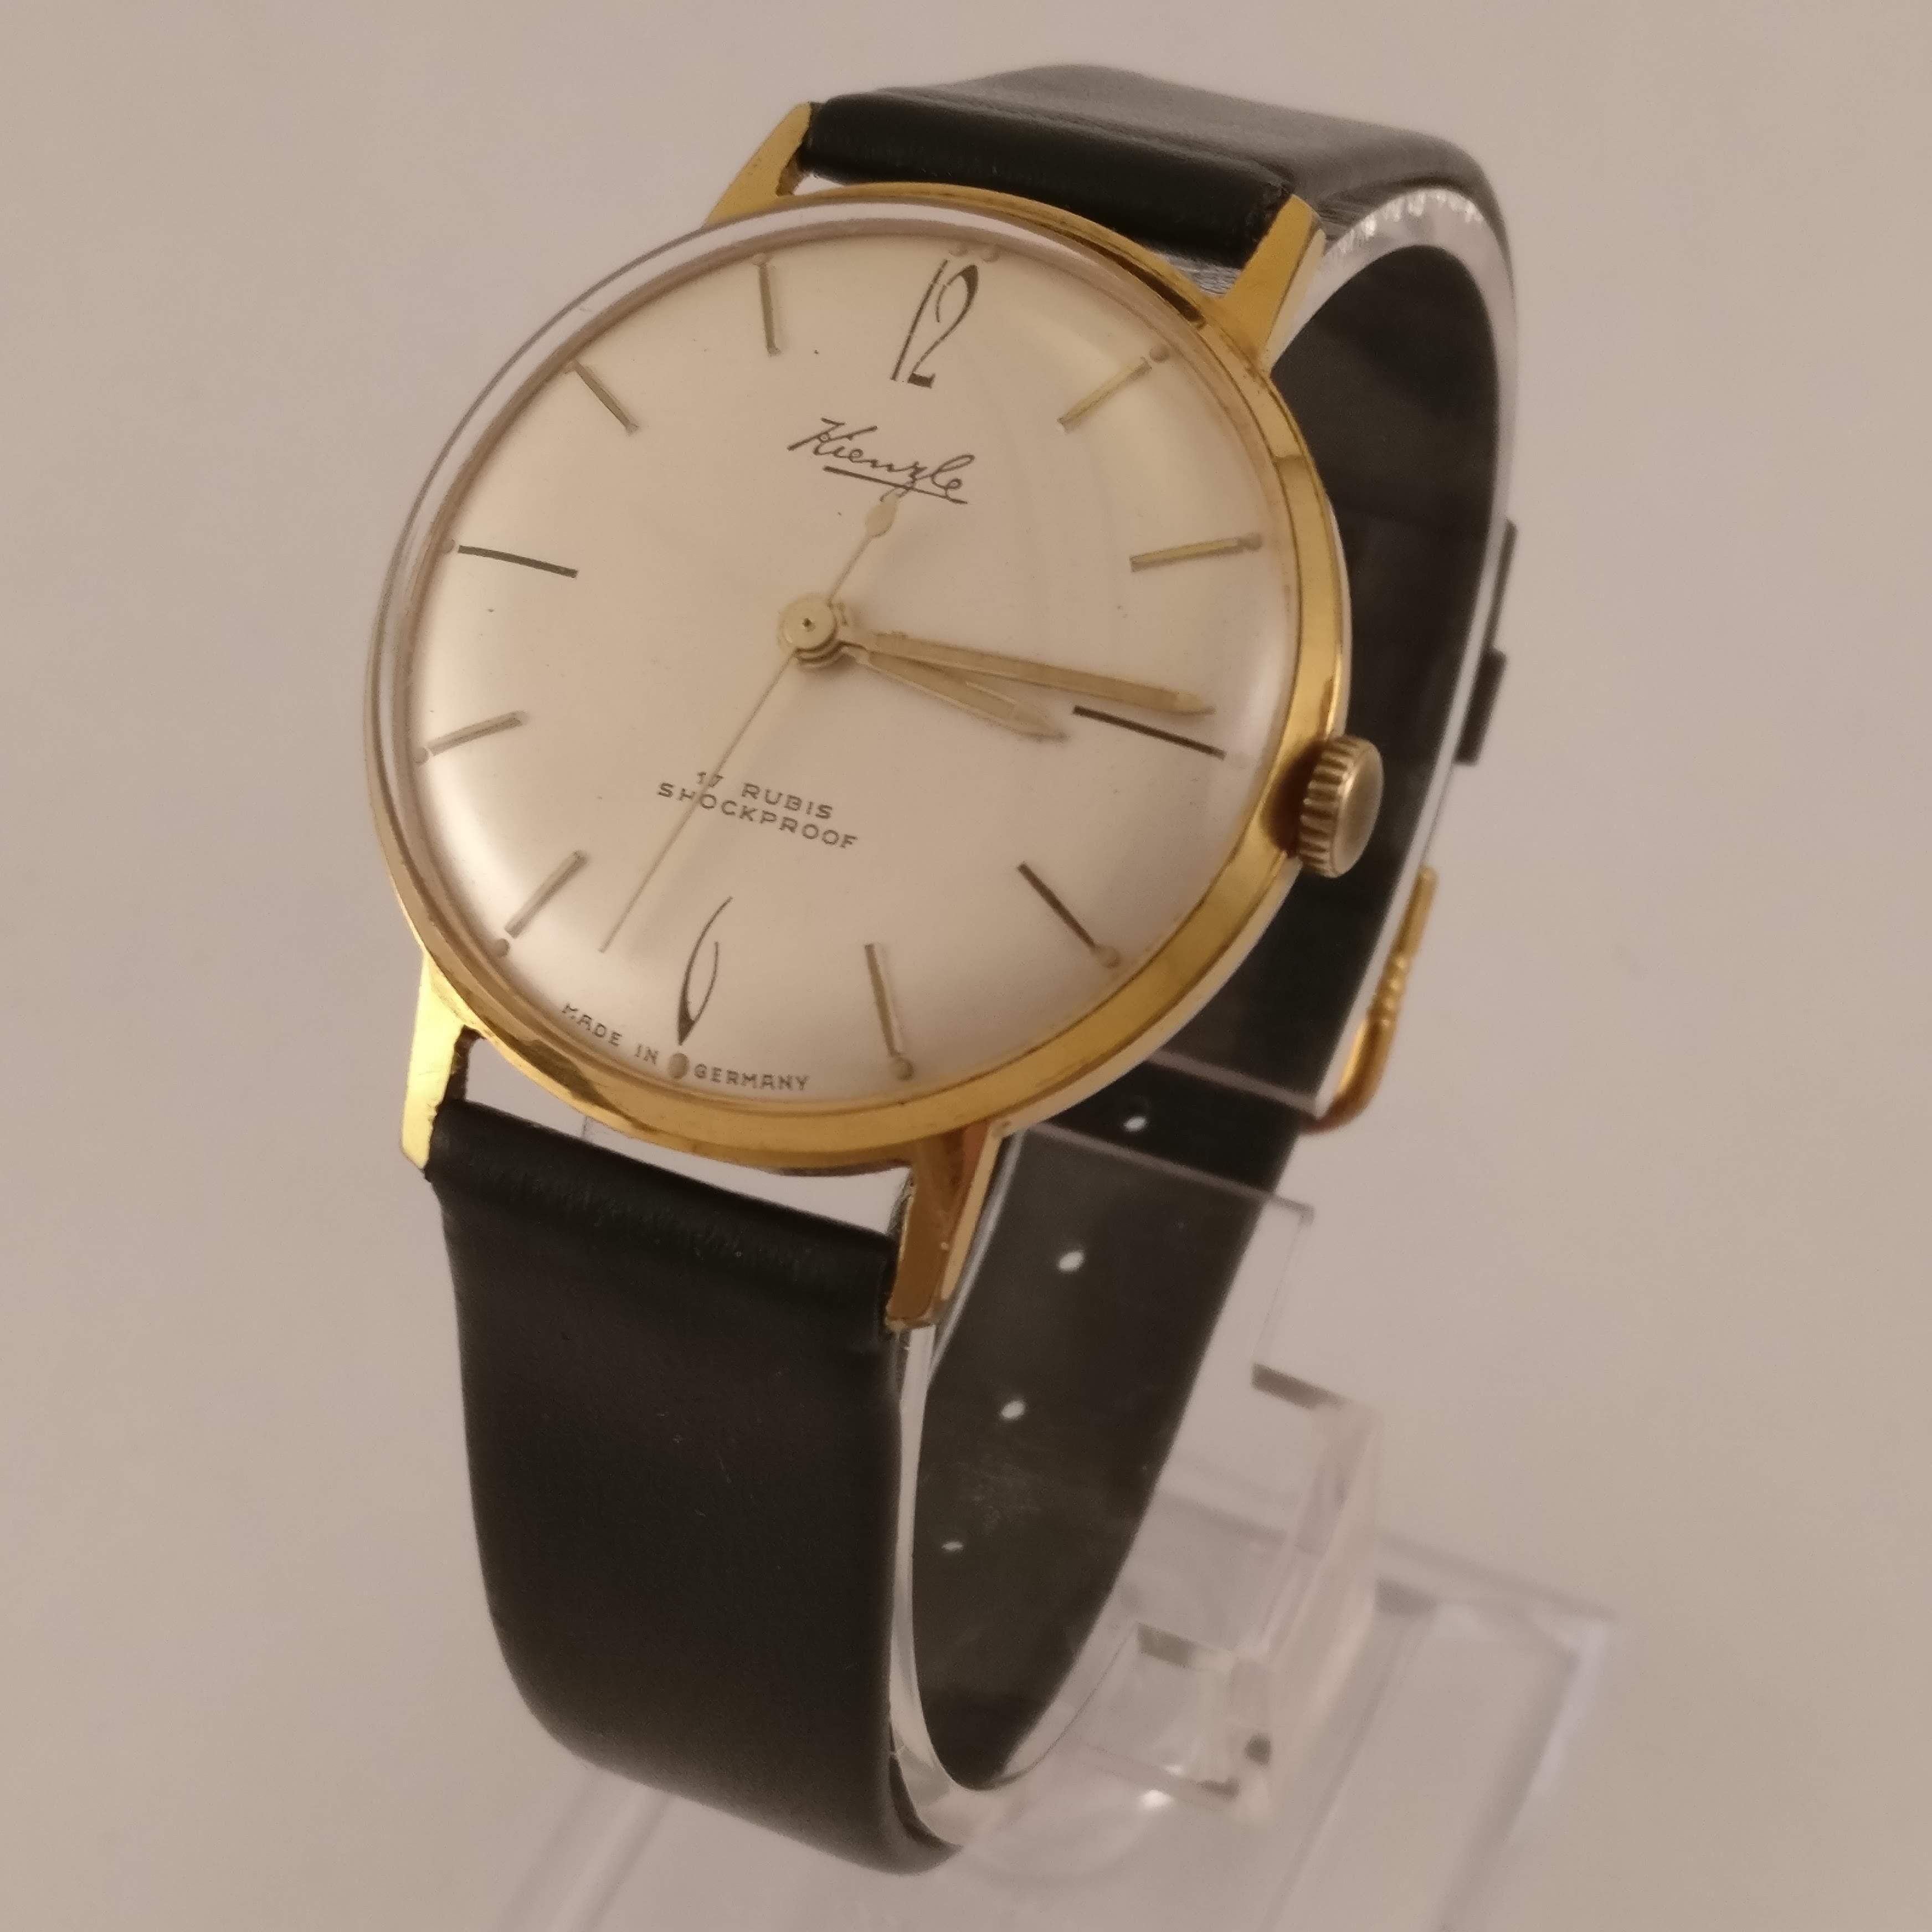 Kienzle Vintage Heren Horloge